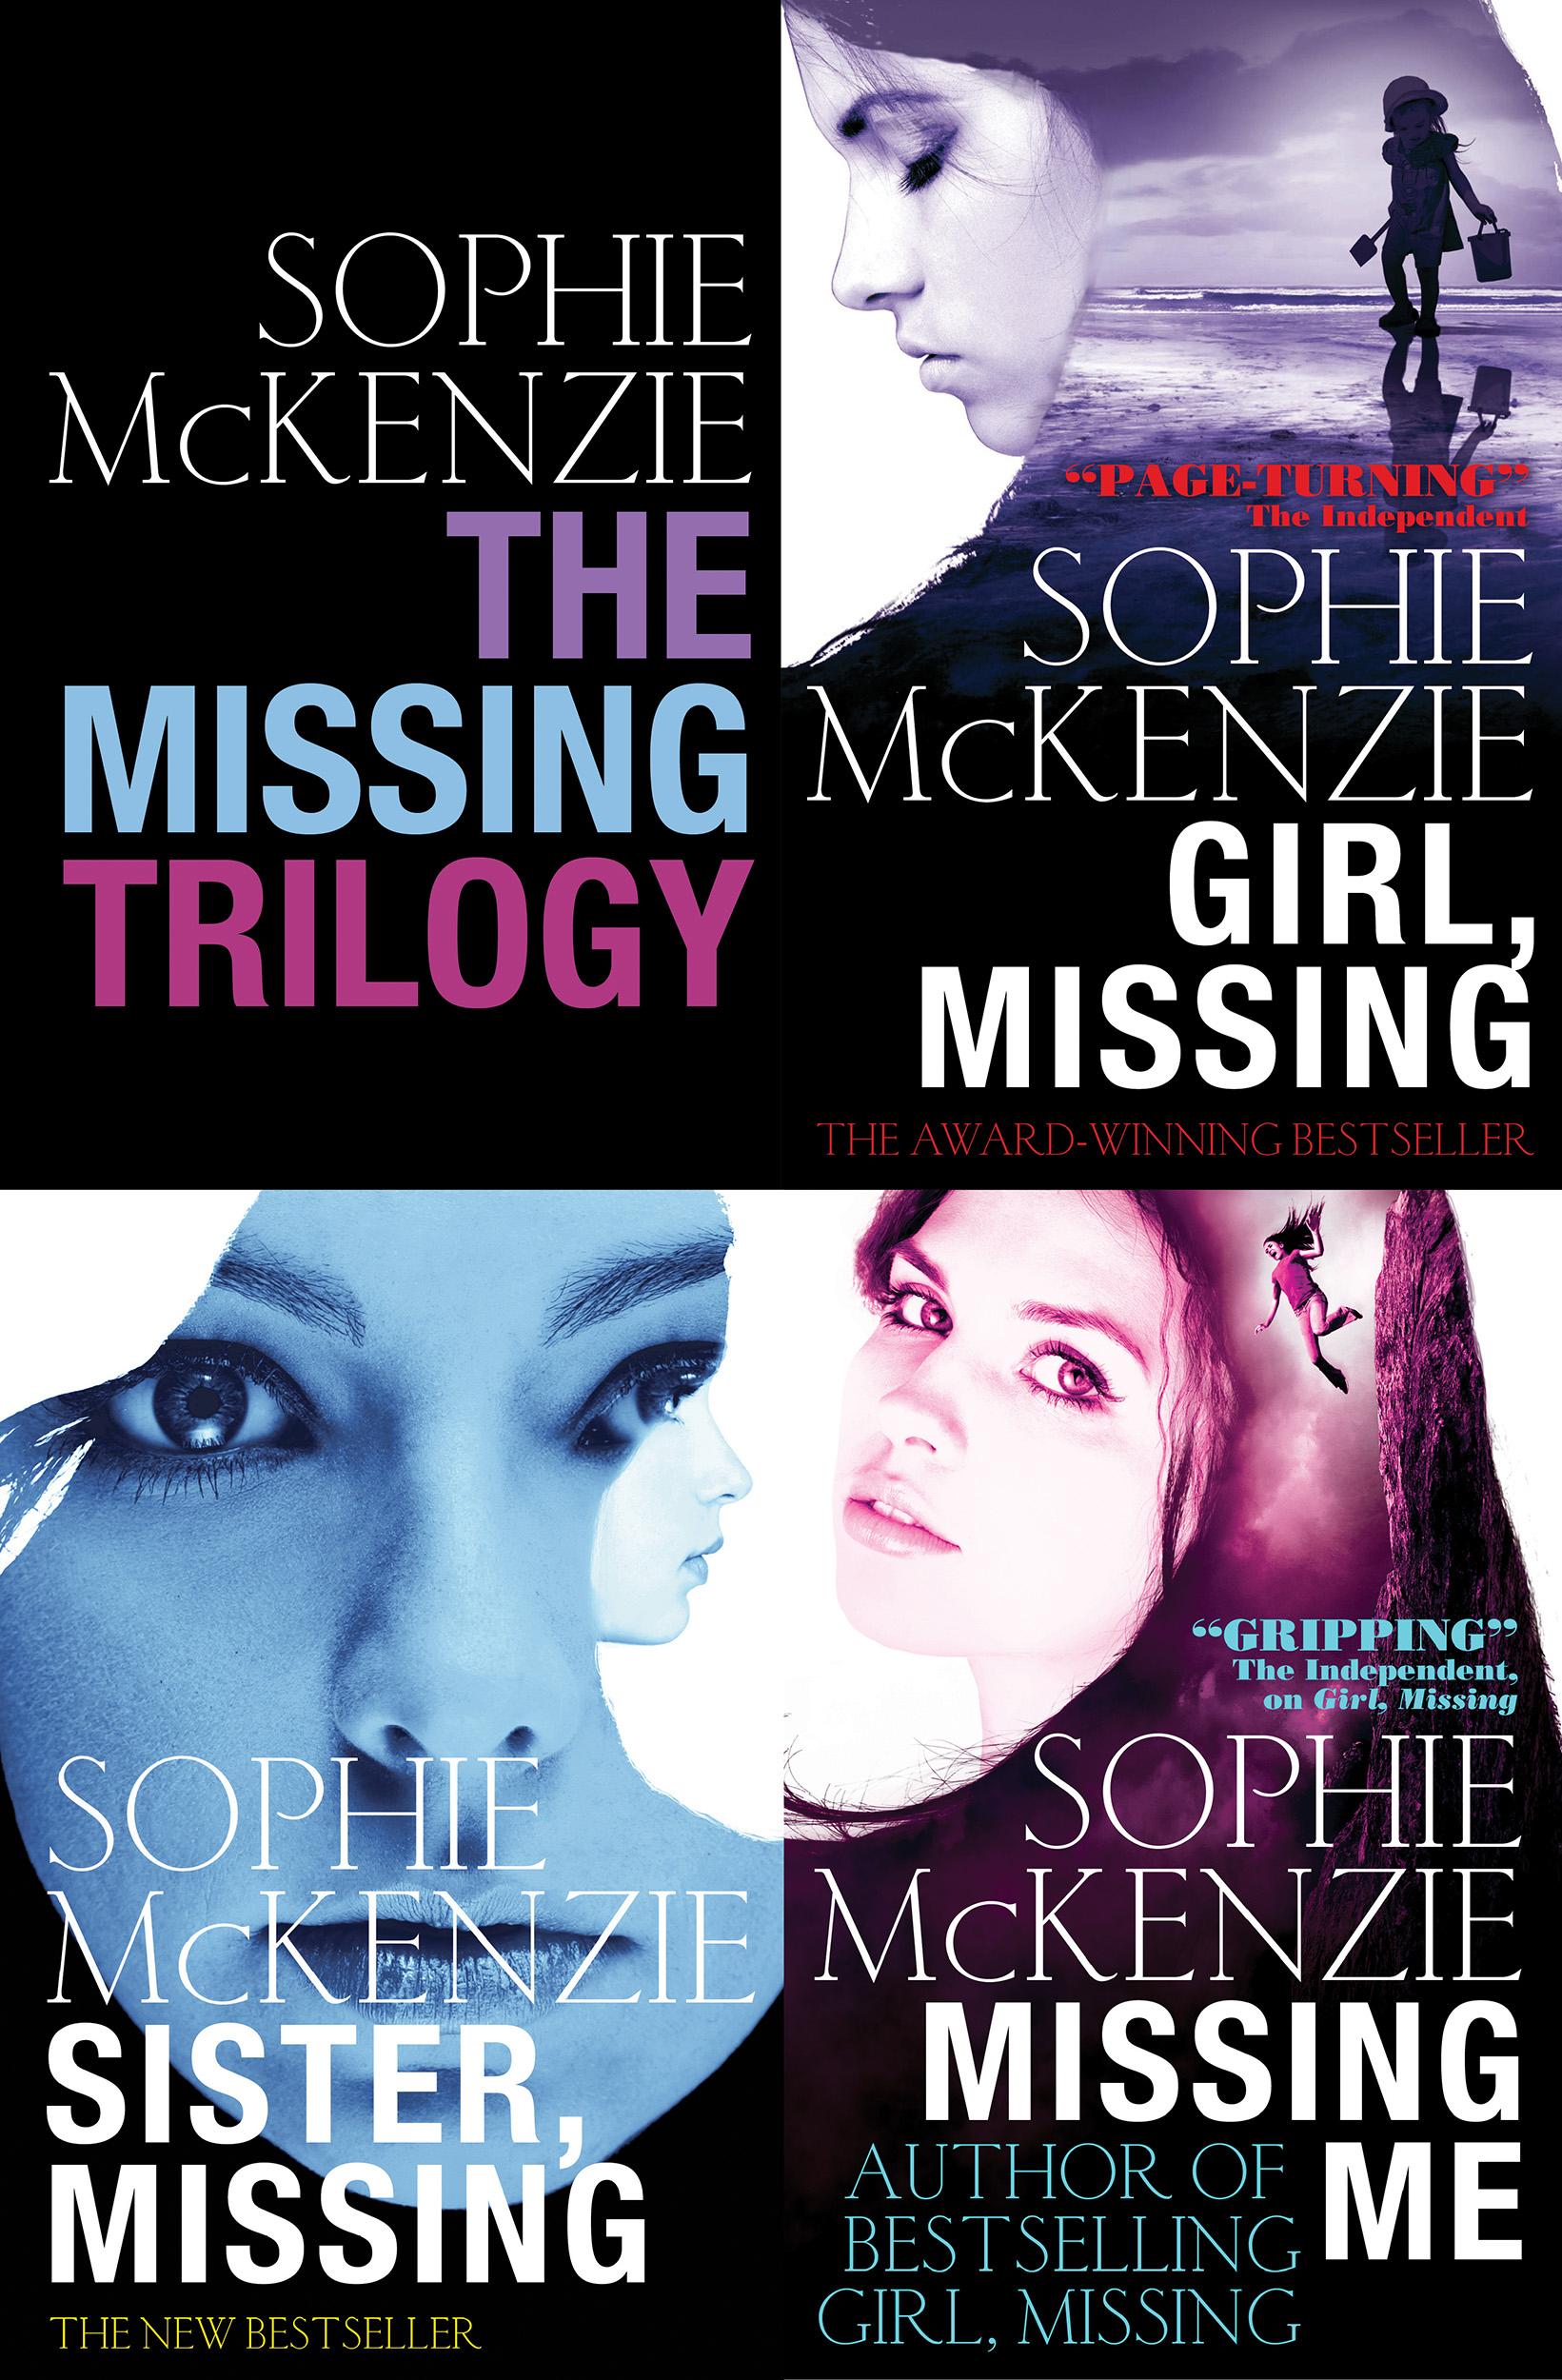 Split second sophie mckenzie book cover